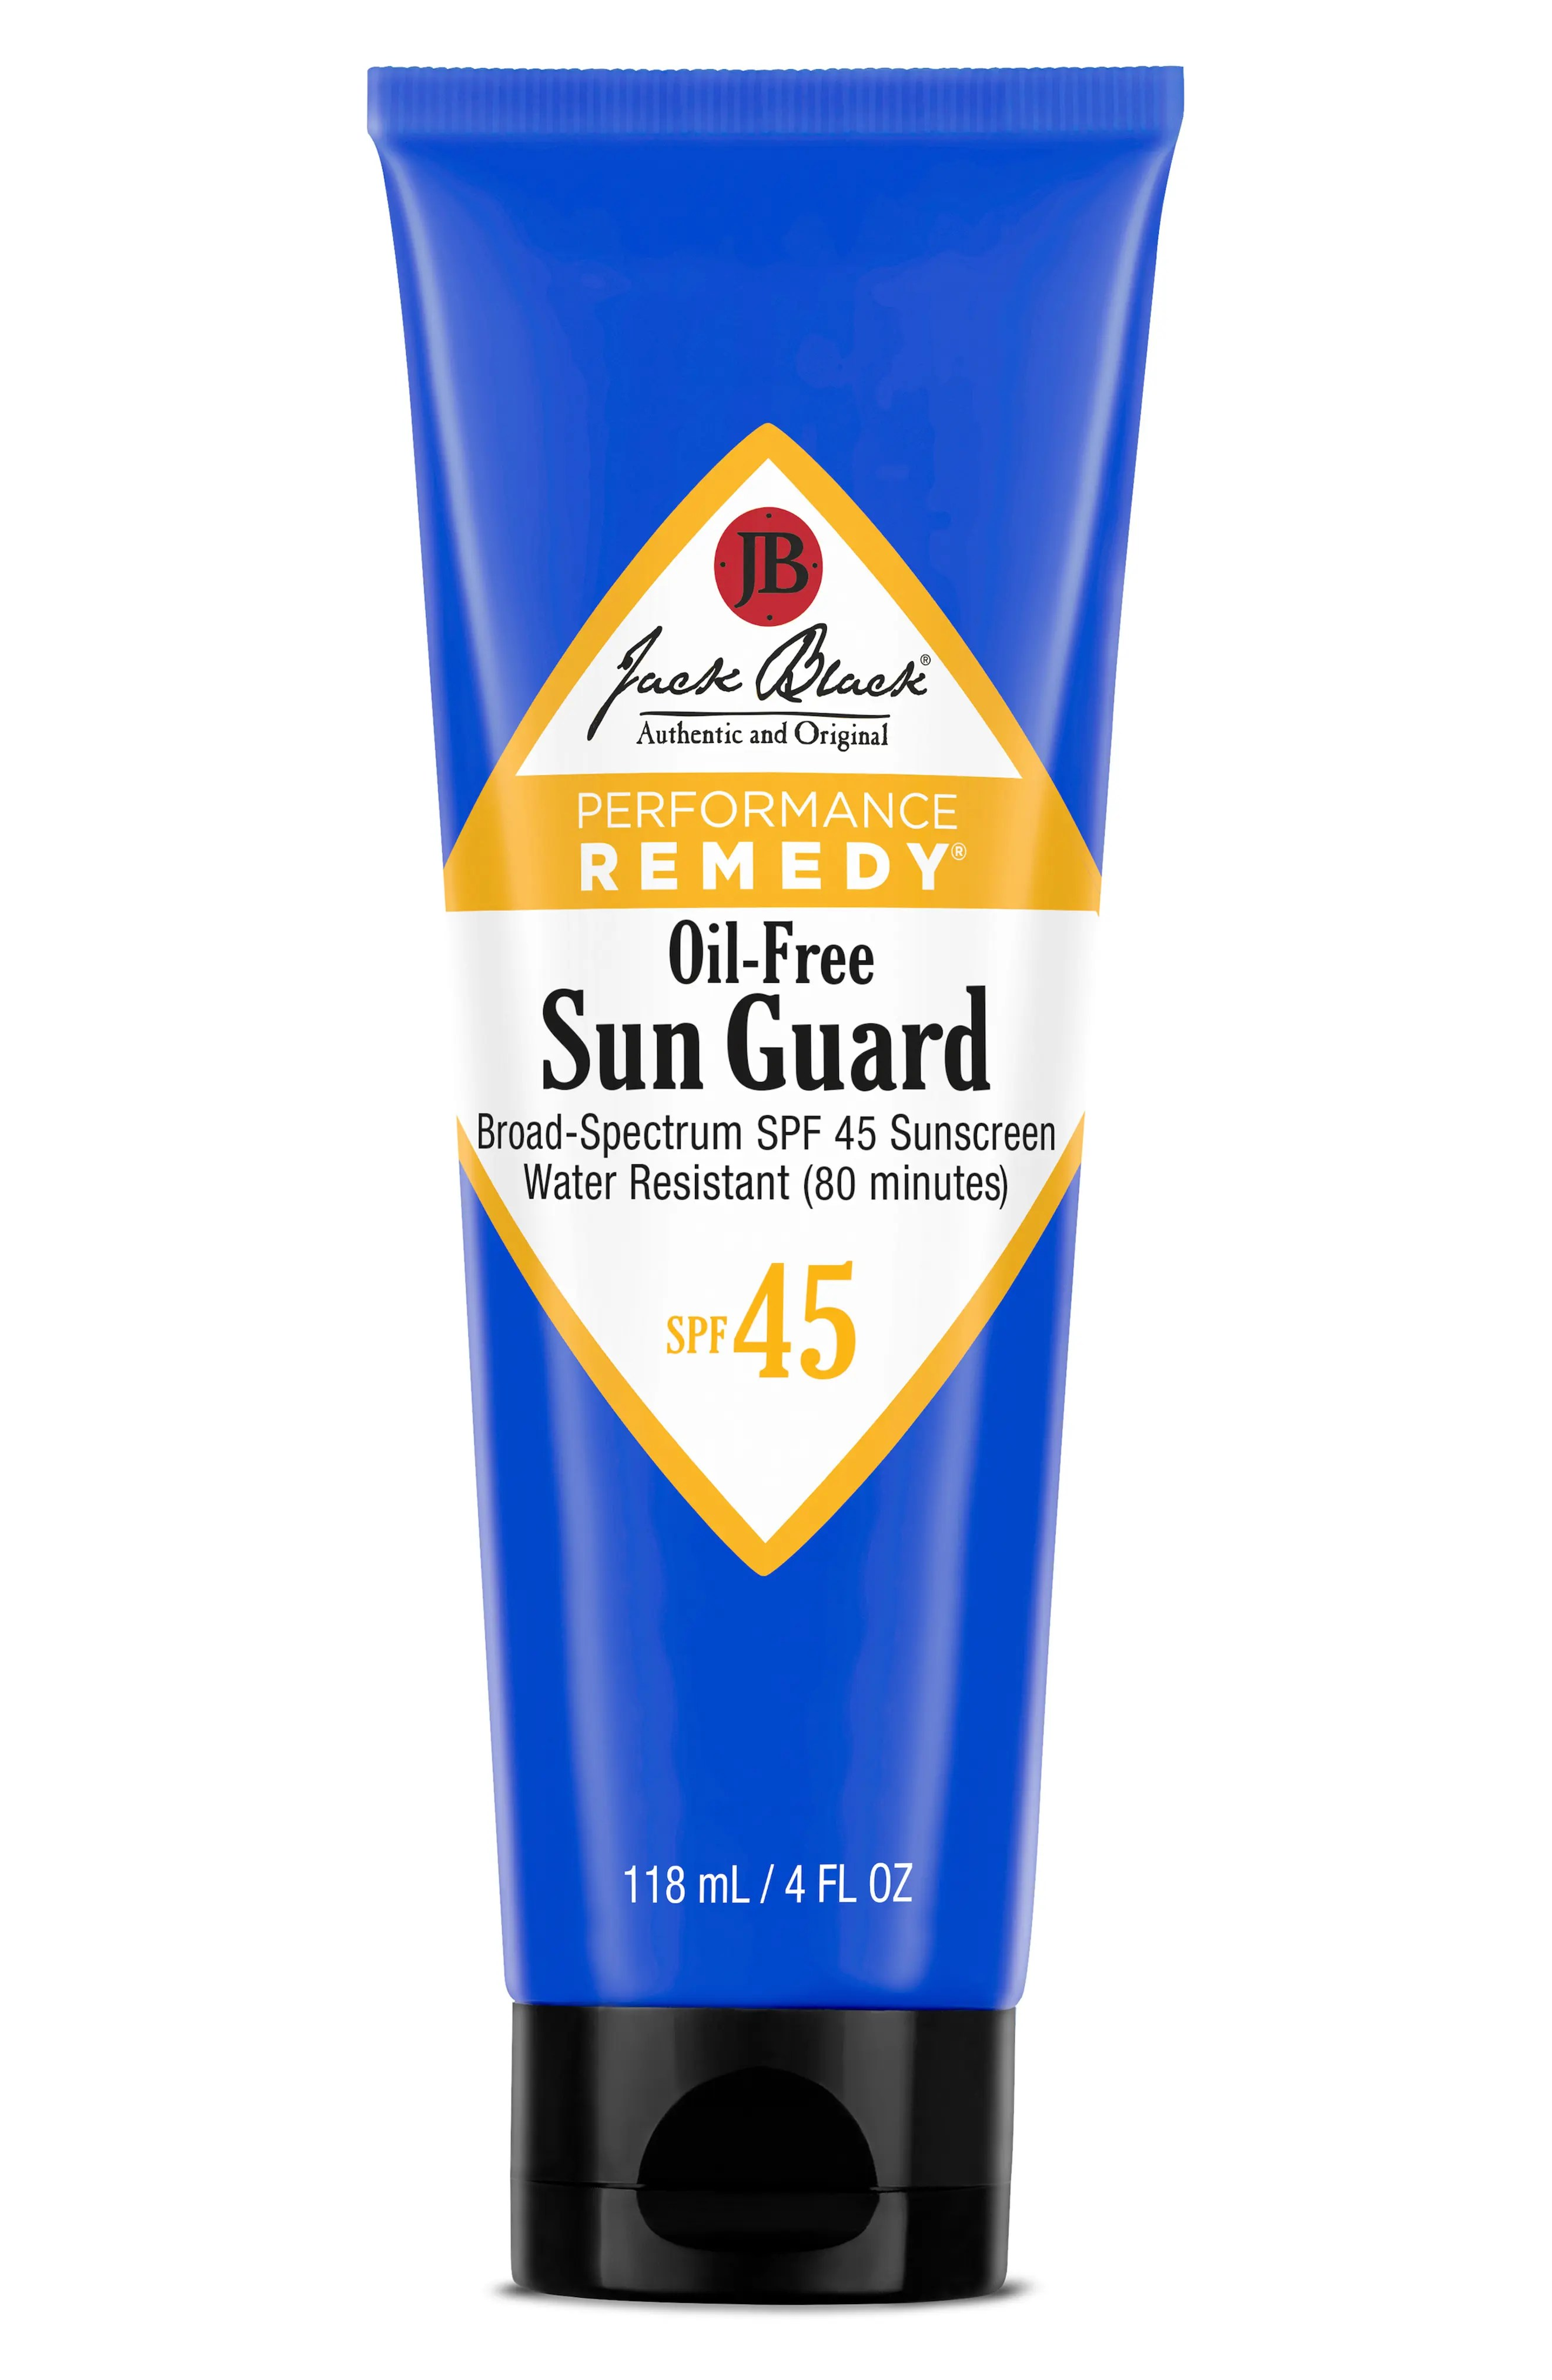 Jack Black Sun Guard Water Resistant Sunscreen Spf 45, Size 4 oz